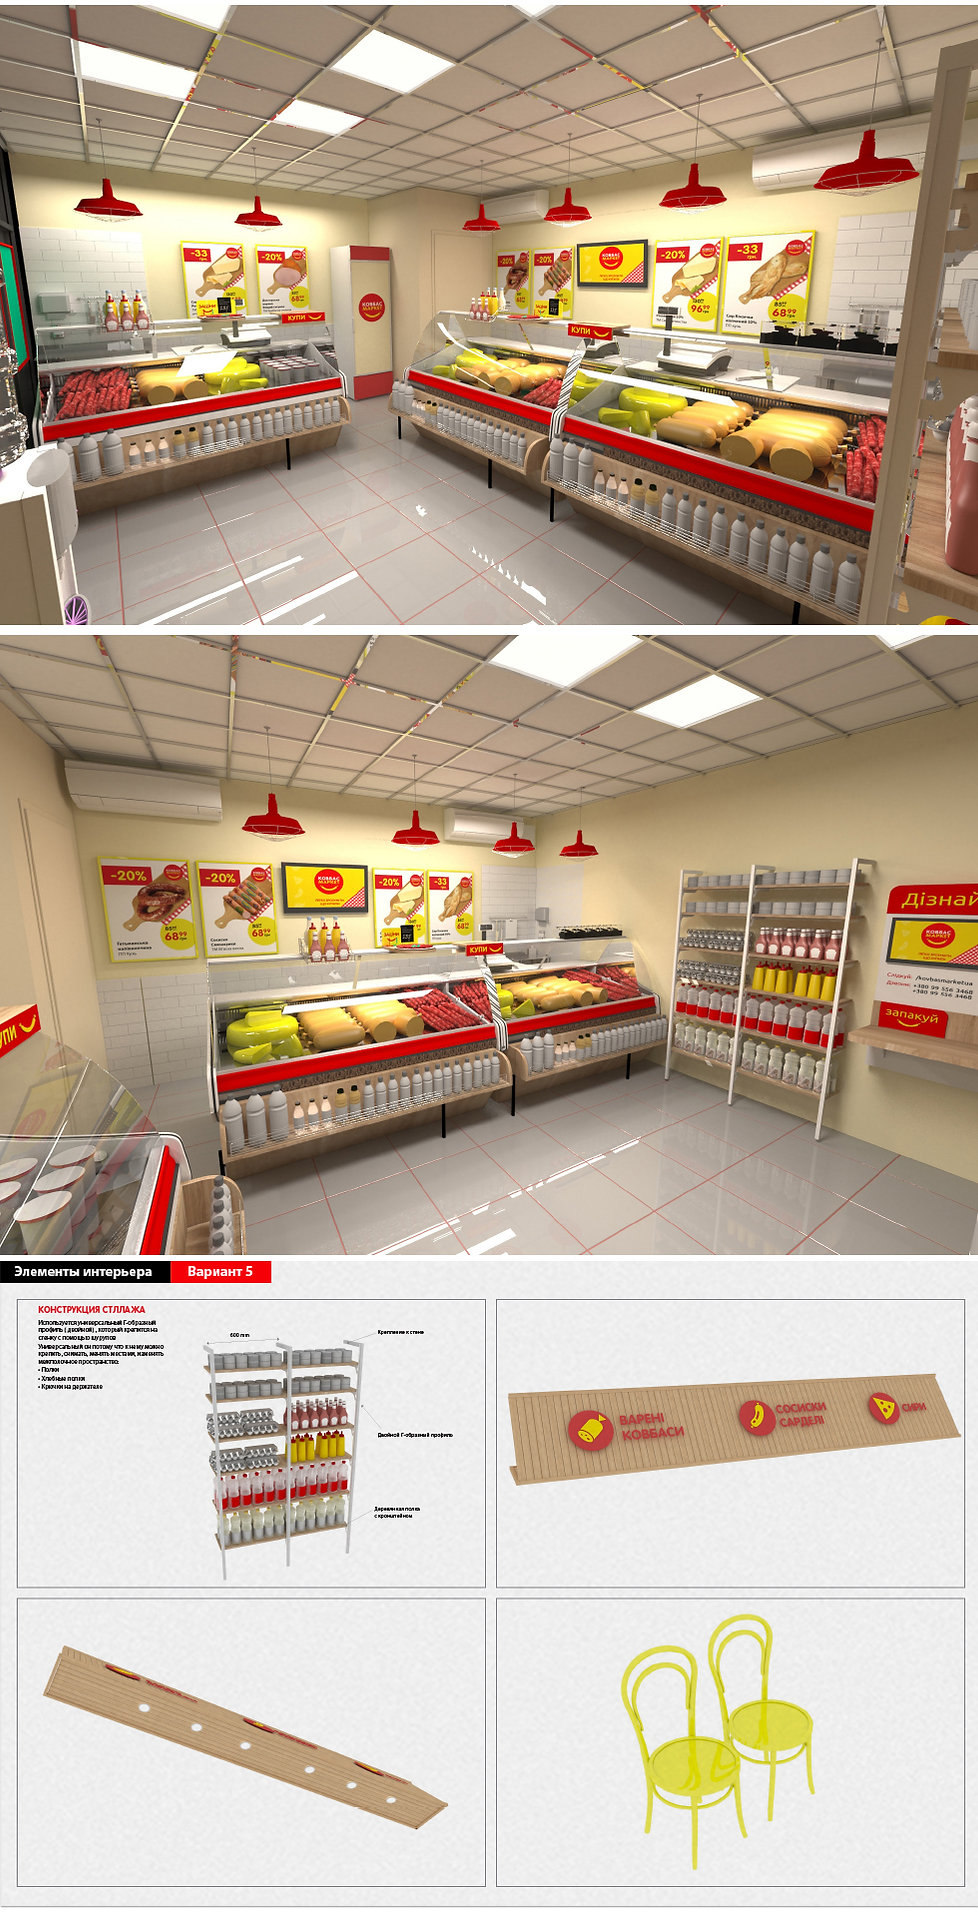 013 magaziis dizaini da proeqtireba.jpg